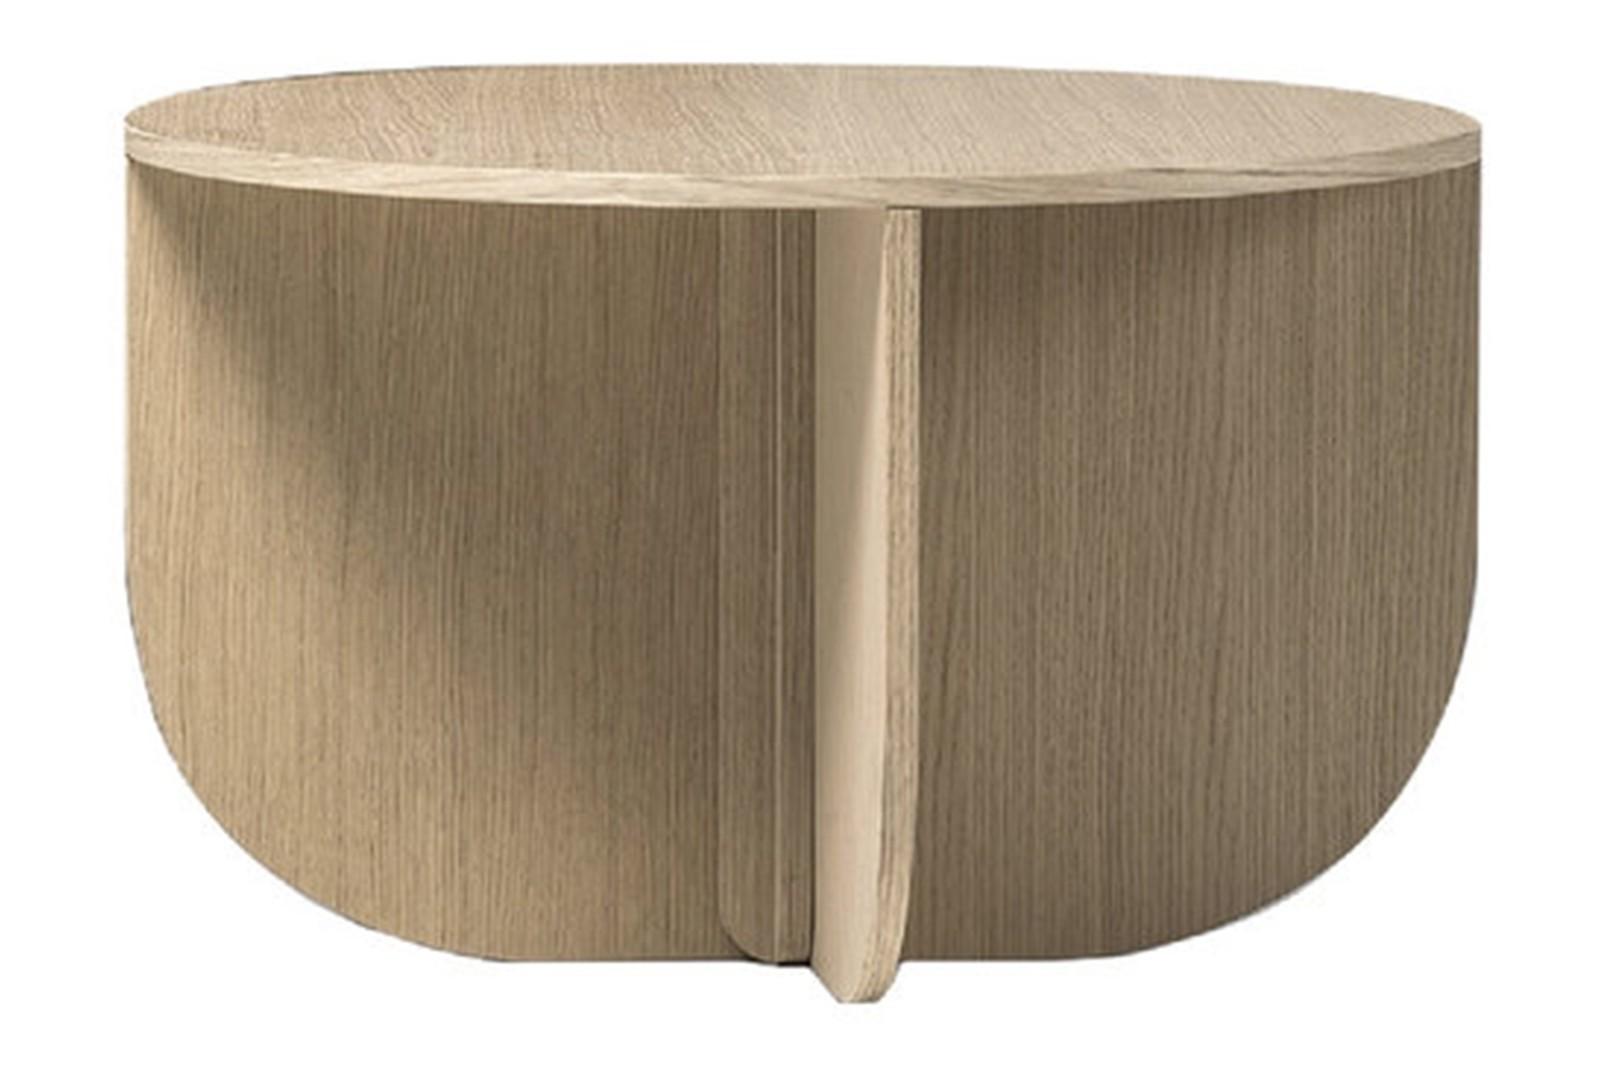 Mil Coffee Table Standard Natural Brushed Oak, Natural Brushed Oak, 75 x 44